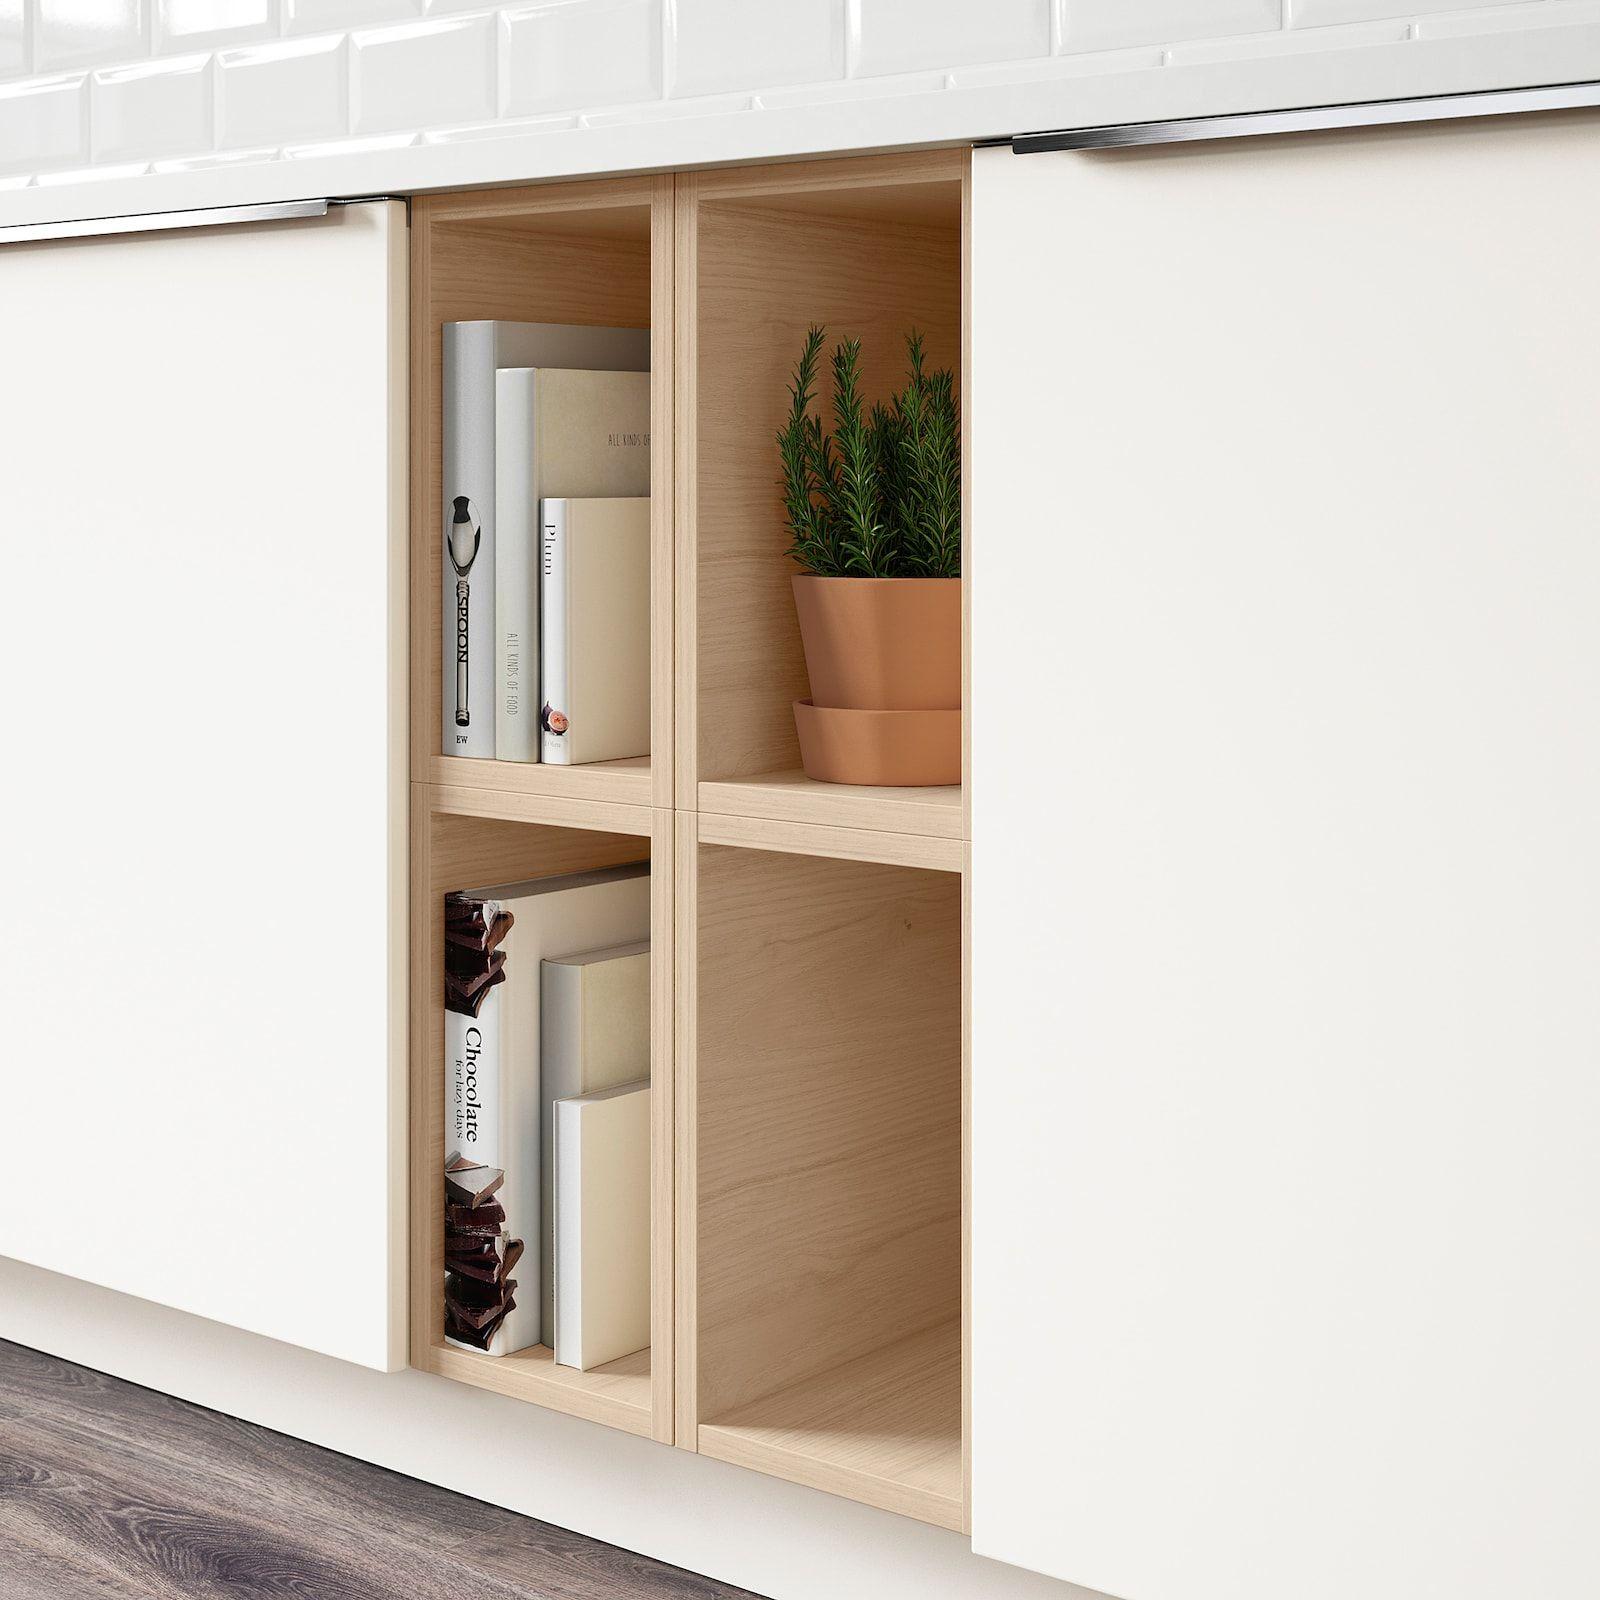 Tutemo Open Cabinet Ash Width 9 Ikea In 2020 Open Cabinets Modern Kitchen Cabinet Design Cabinet